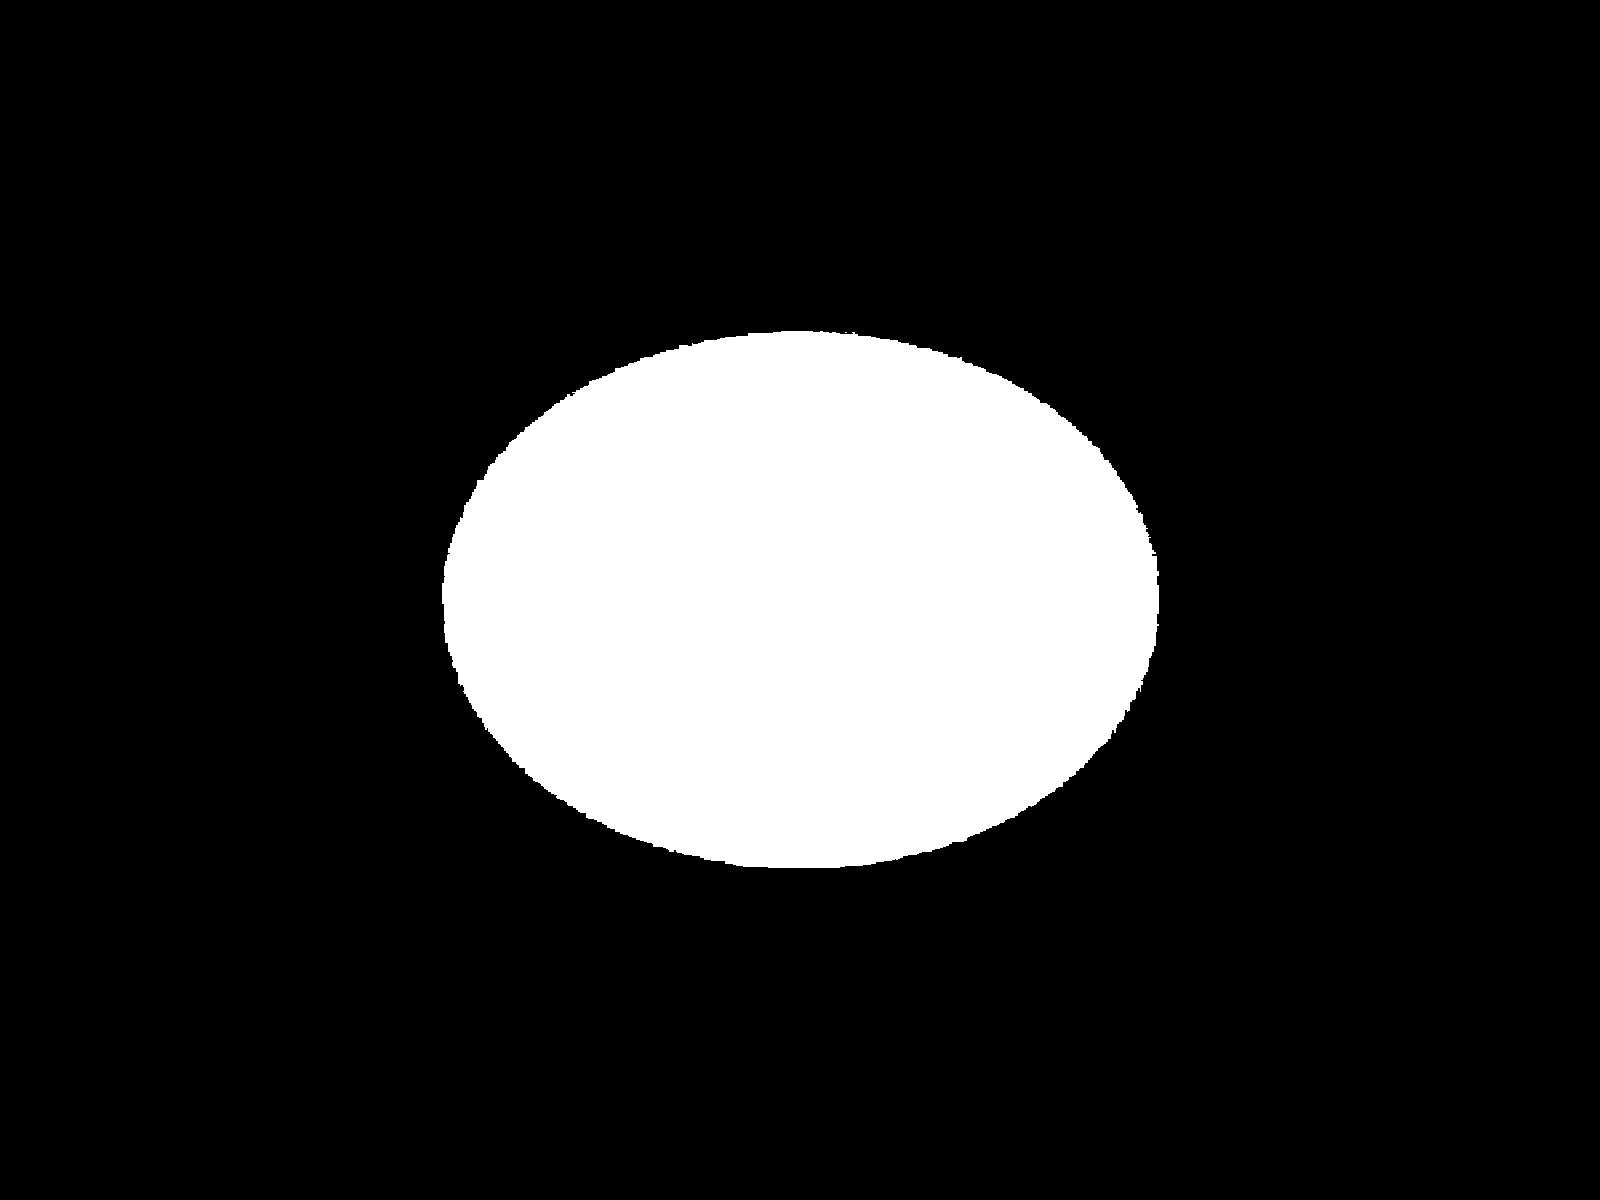 Click image for larger version.  Name:13 black oval vignette.png Views:33760 Size:179.1 KB ID:3680